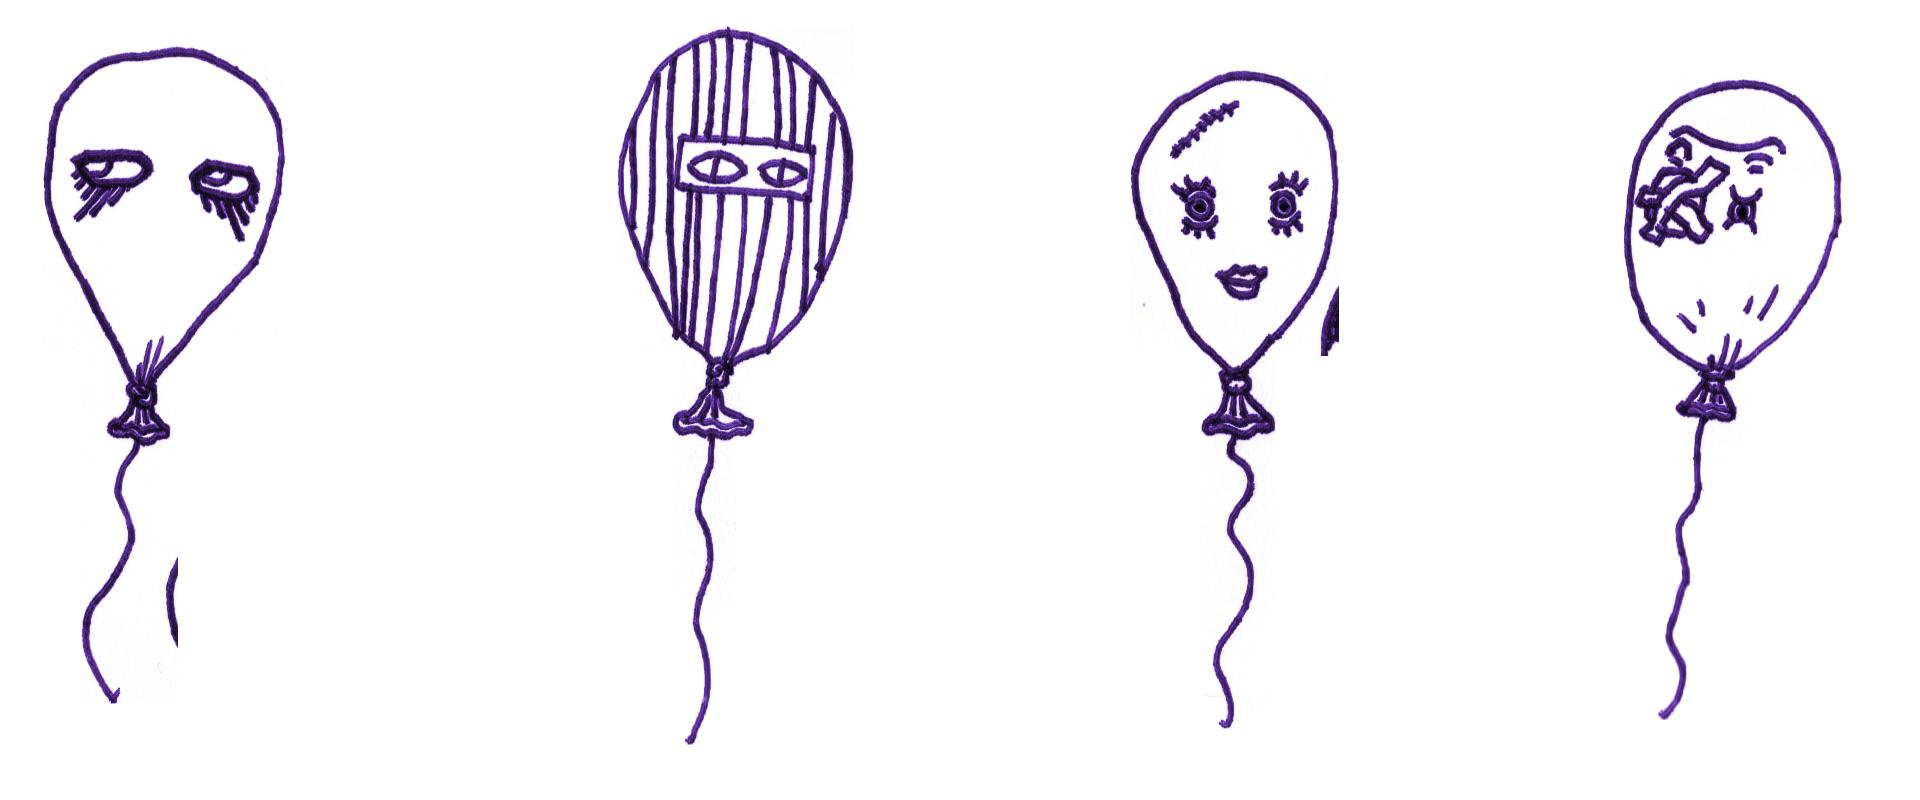 balloonblackfront_large